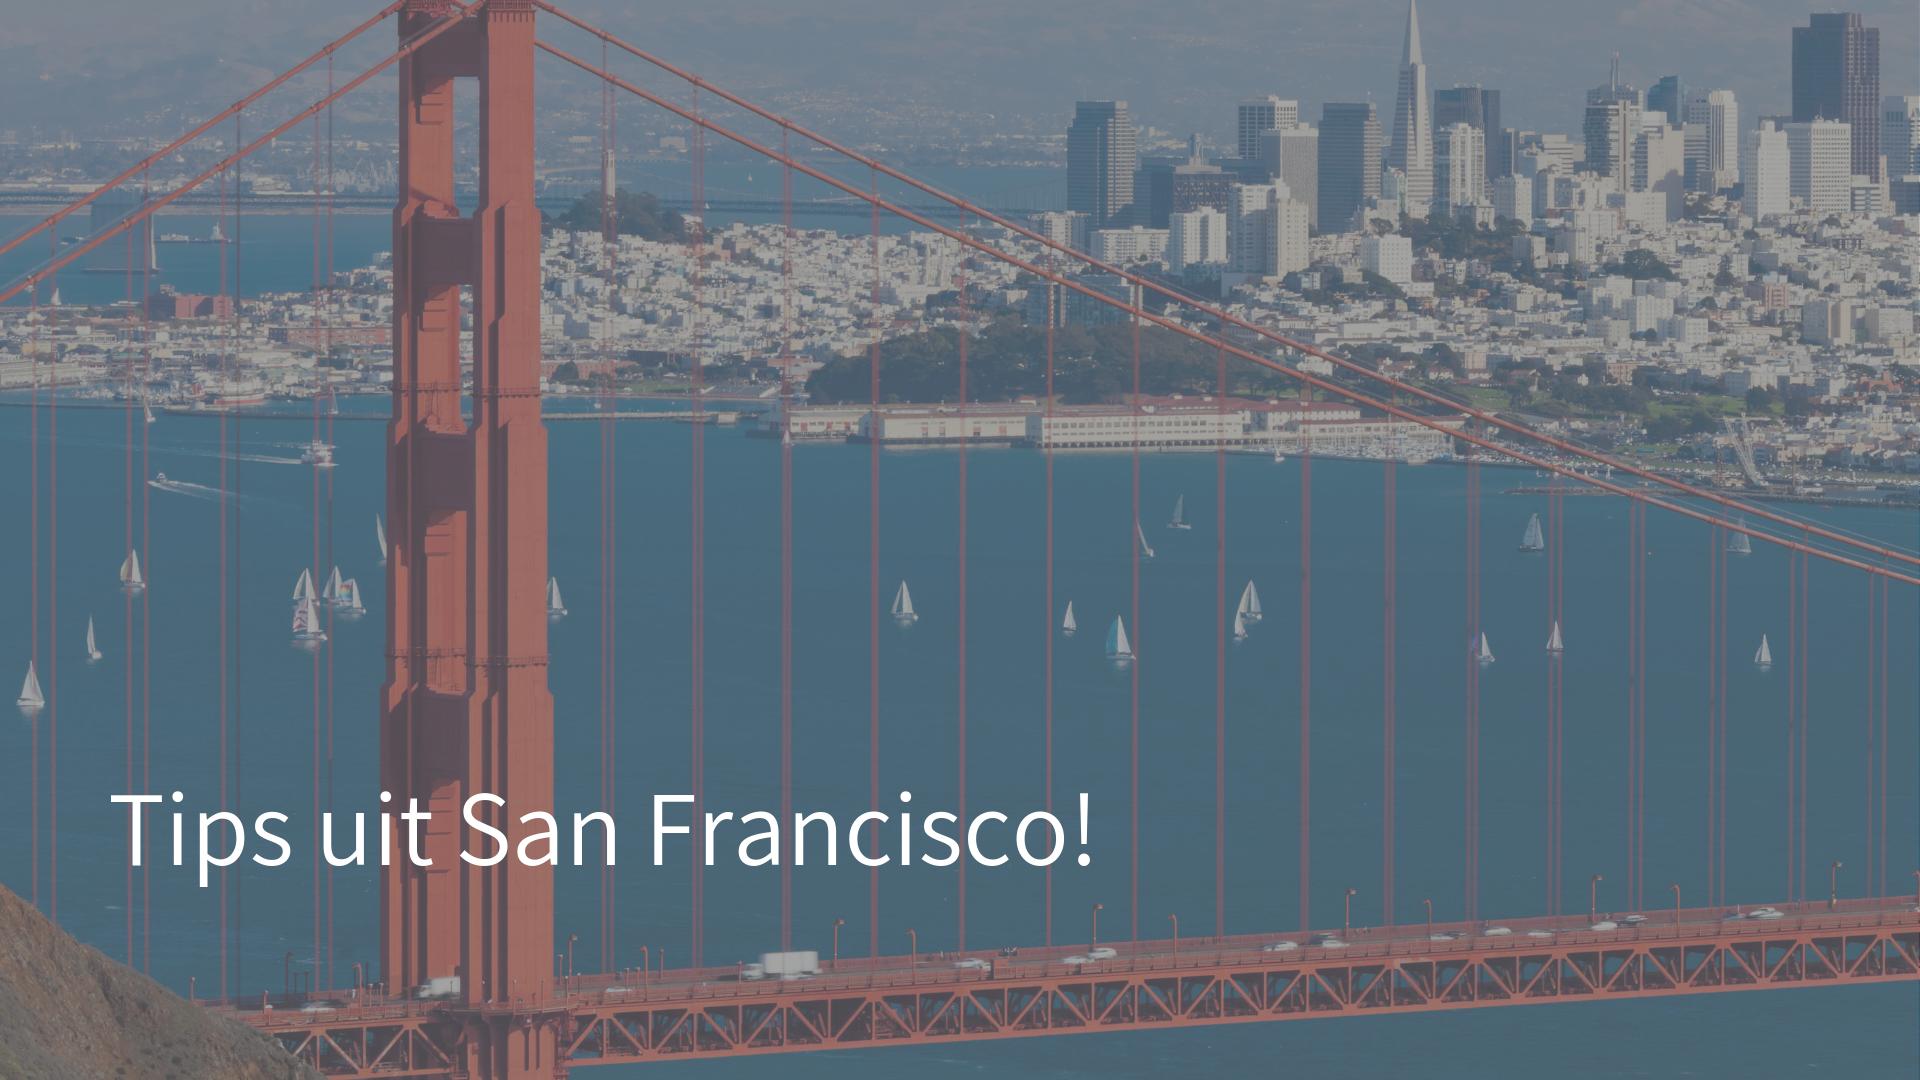 Tips uit San Francisco